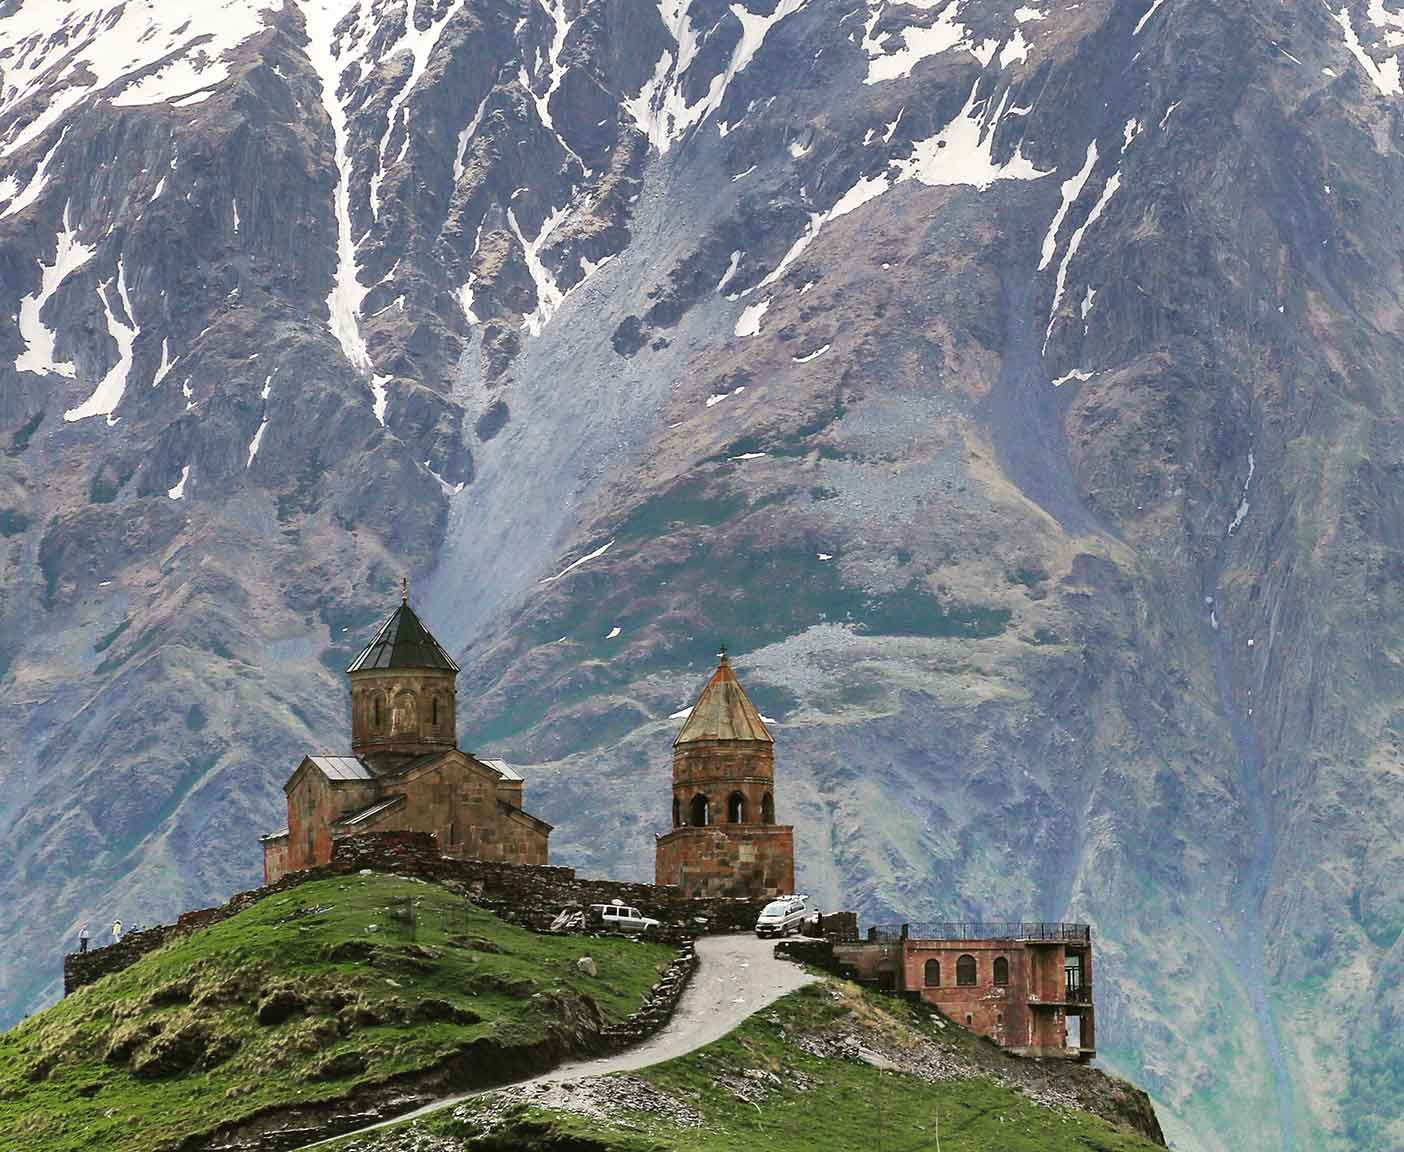 georgien-wohnmobil-erfahrungsbericht-camping-urlaub-preisniveau-tiflis-Gergeti-Trinity-Church